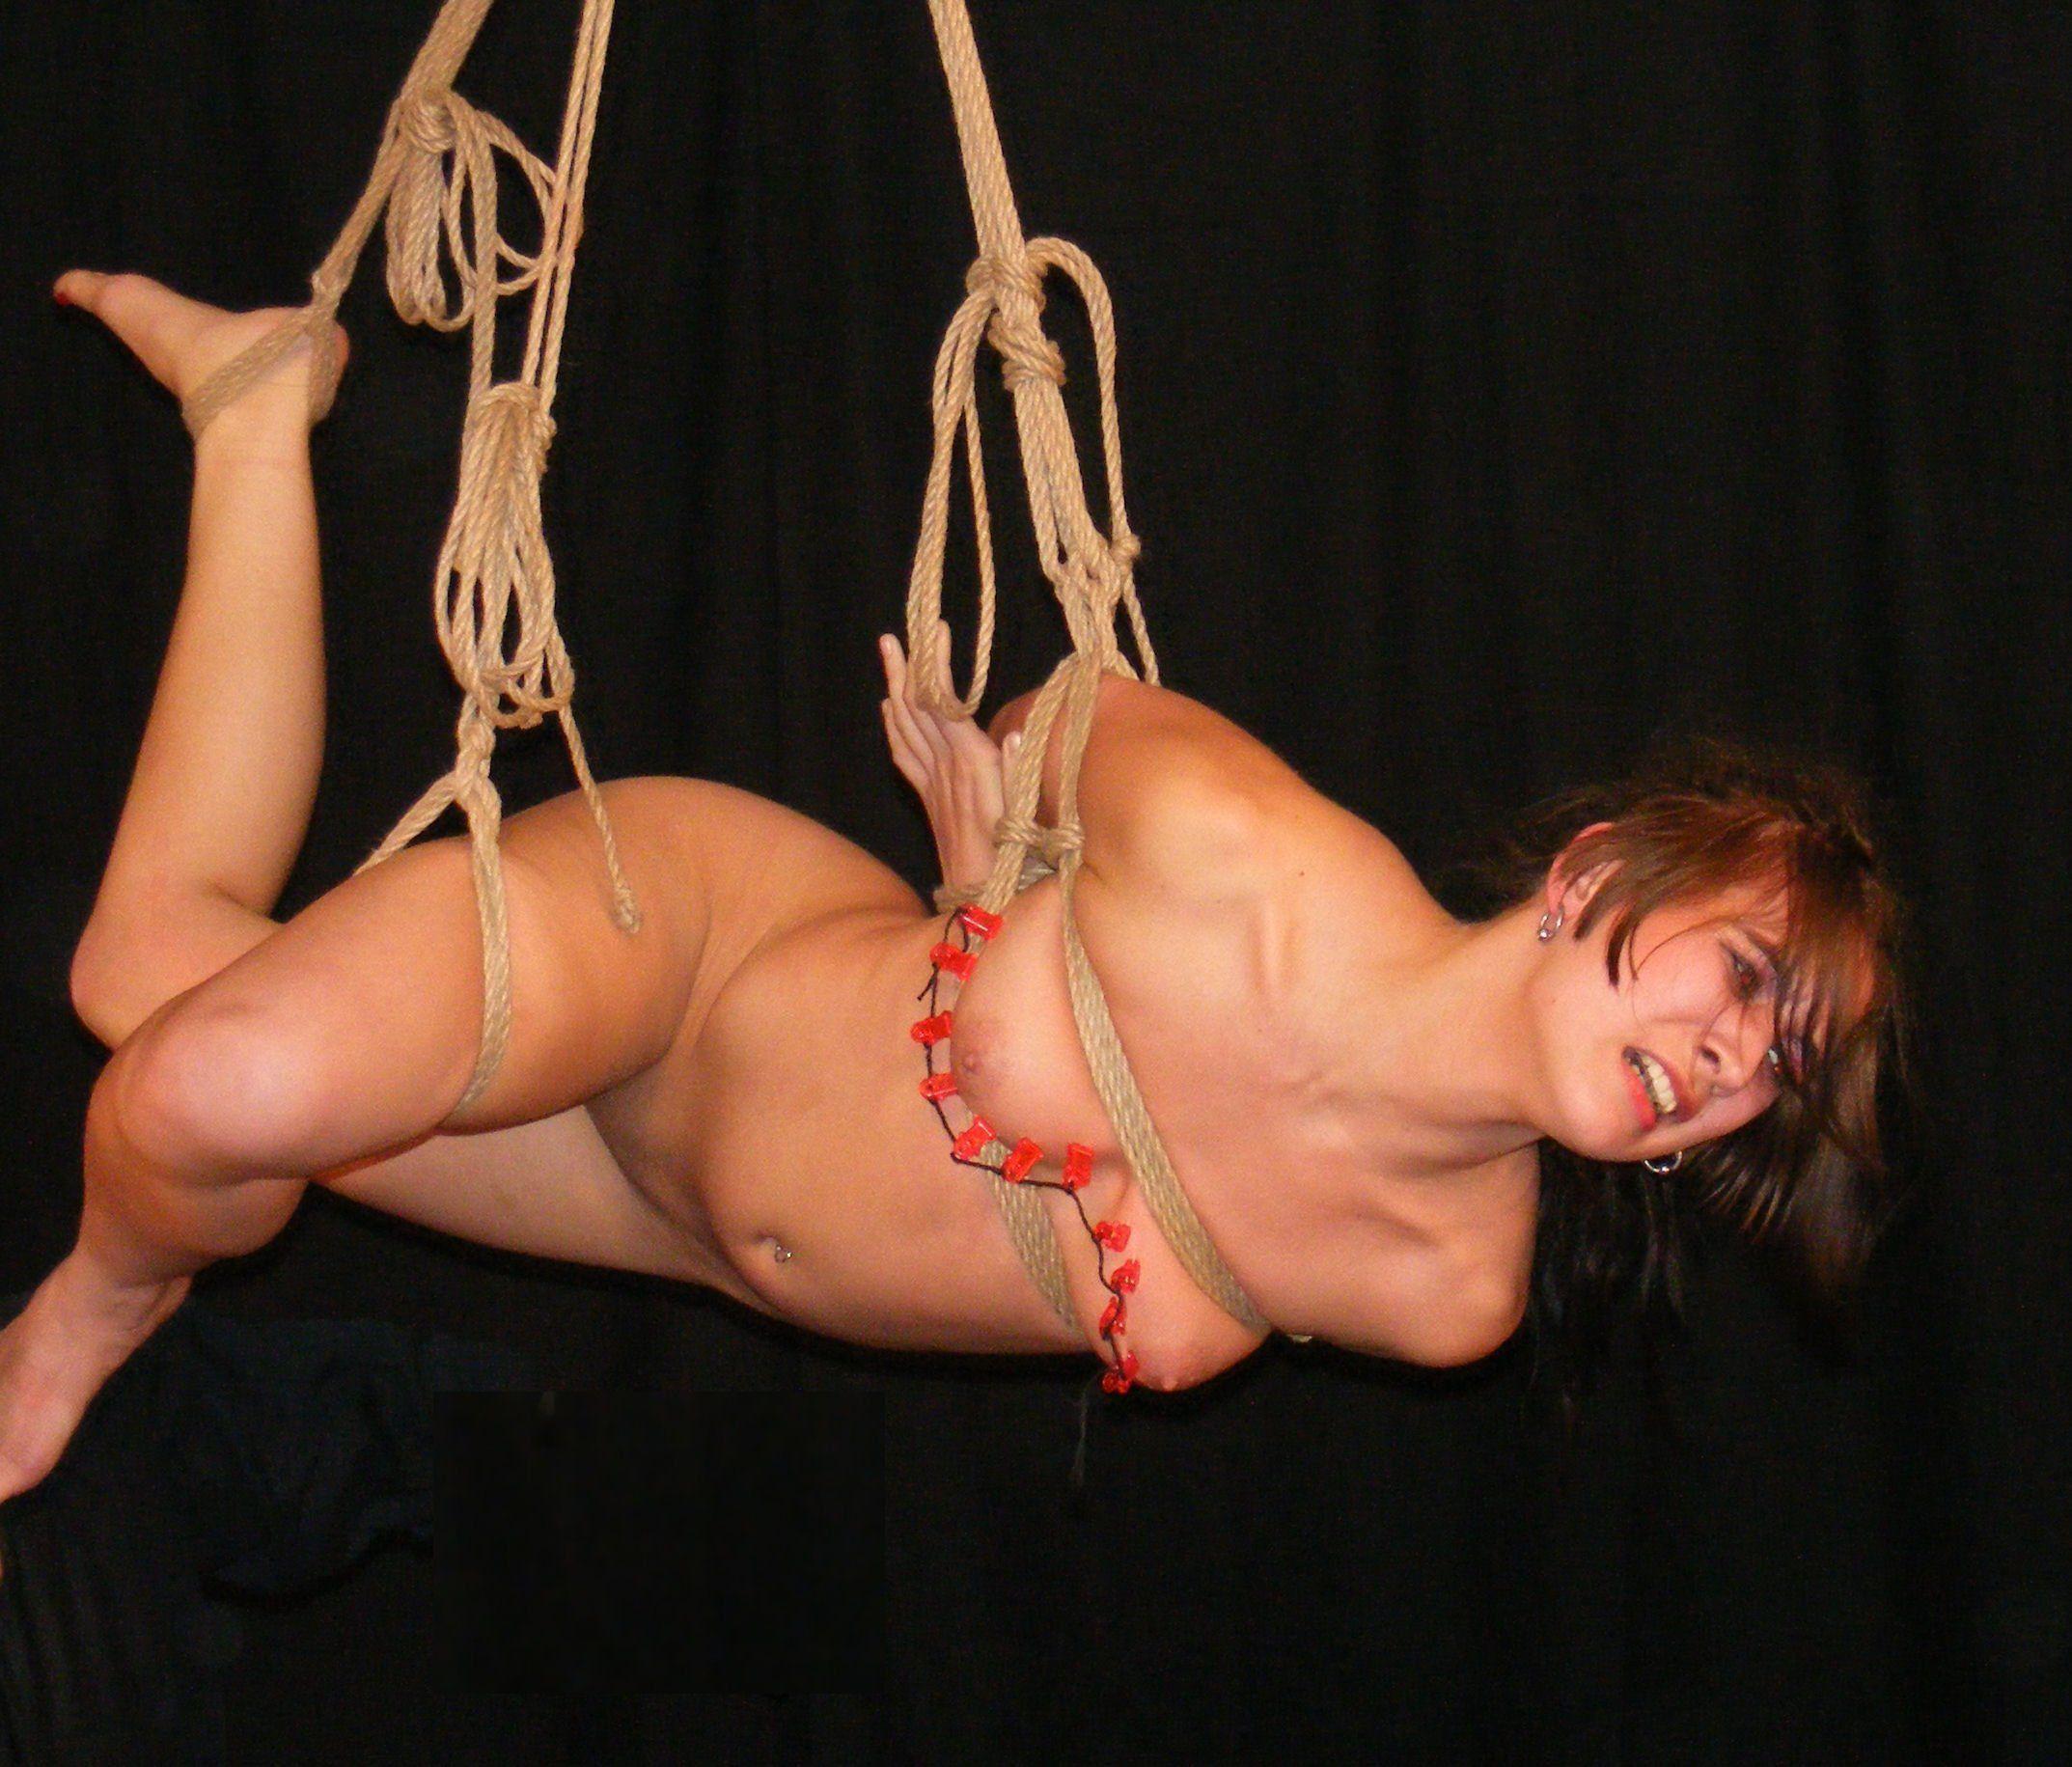 Anime Torture Porn Gif bondage nipple torture . new porn. comments: 2